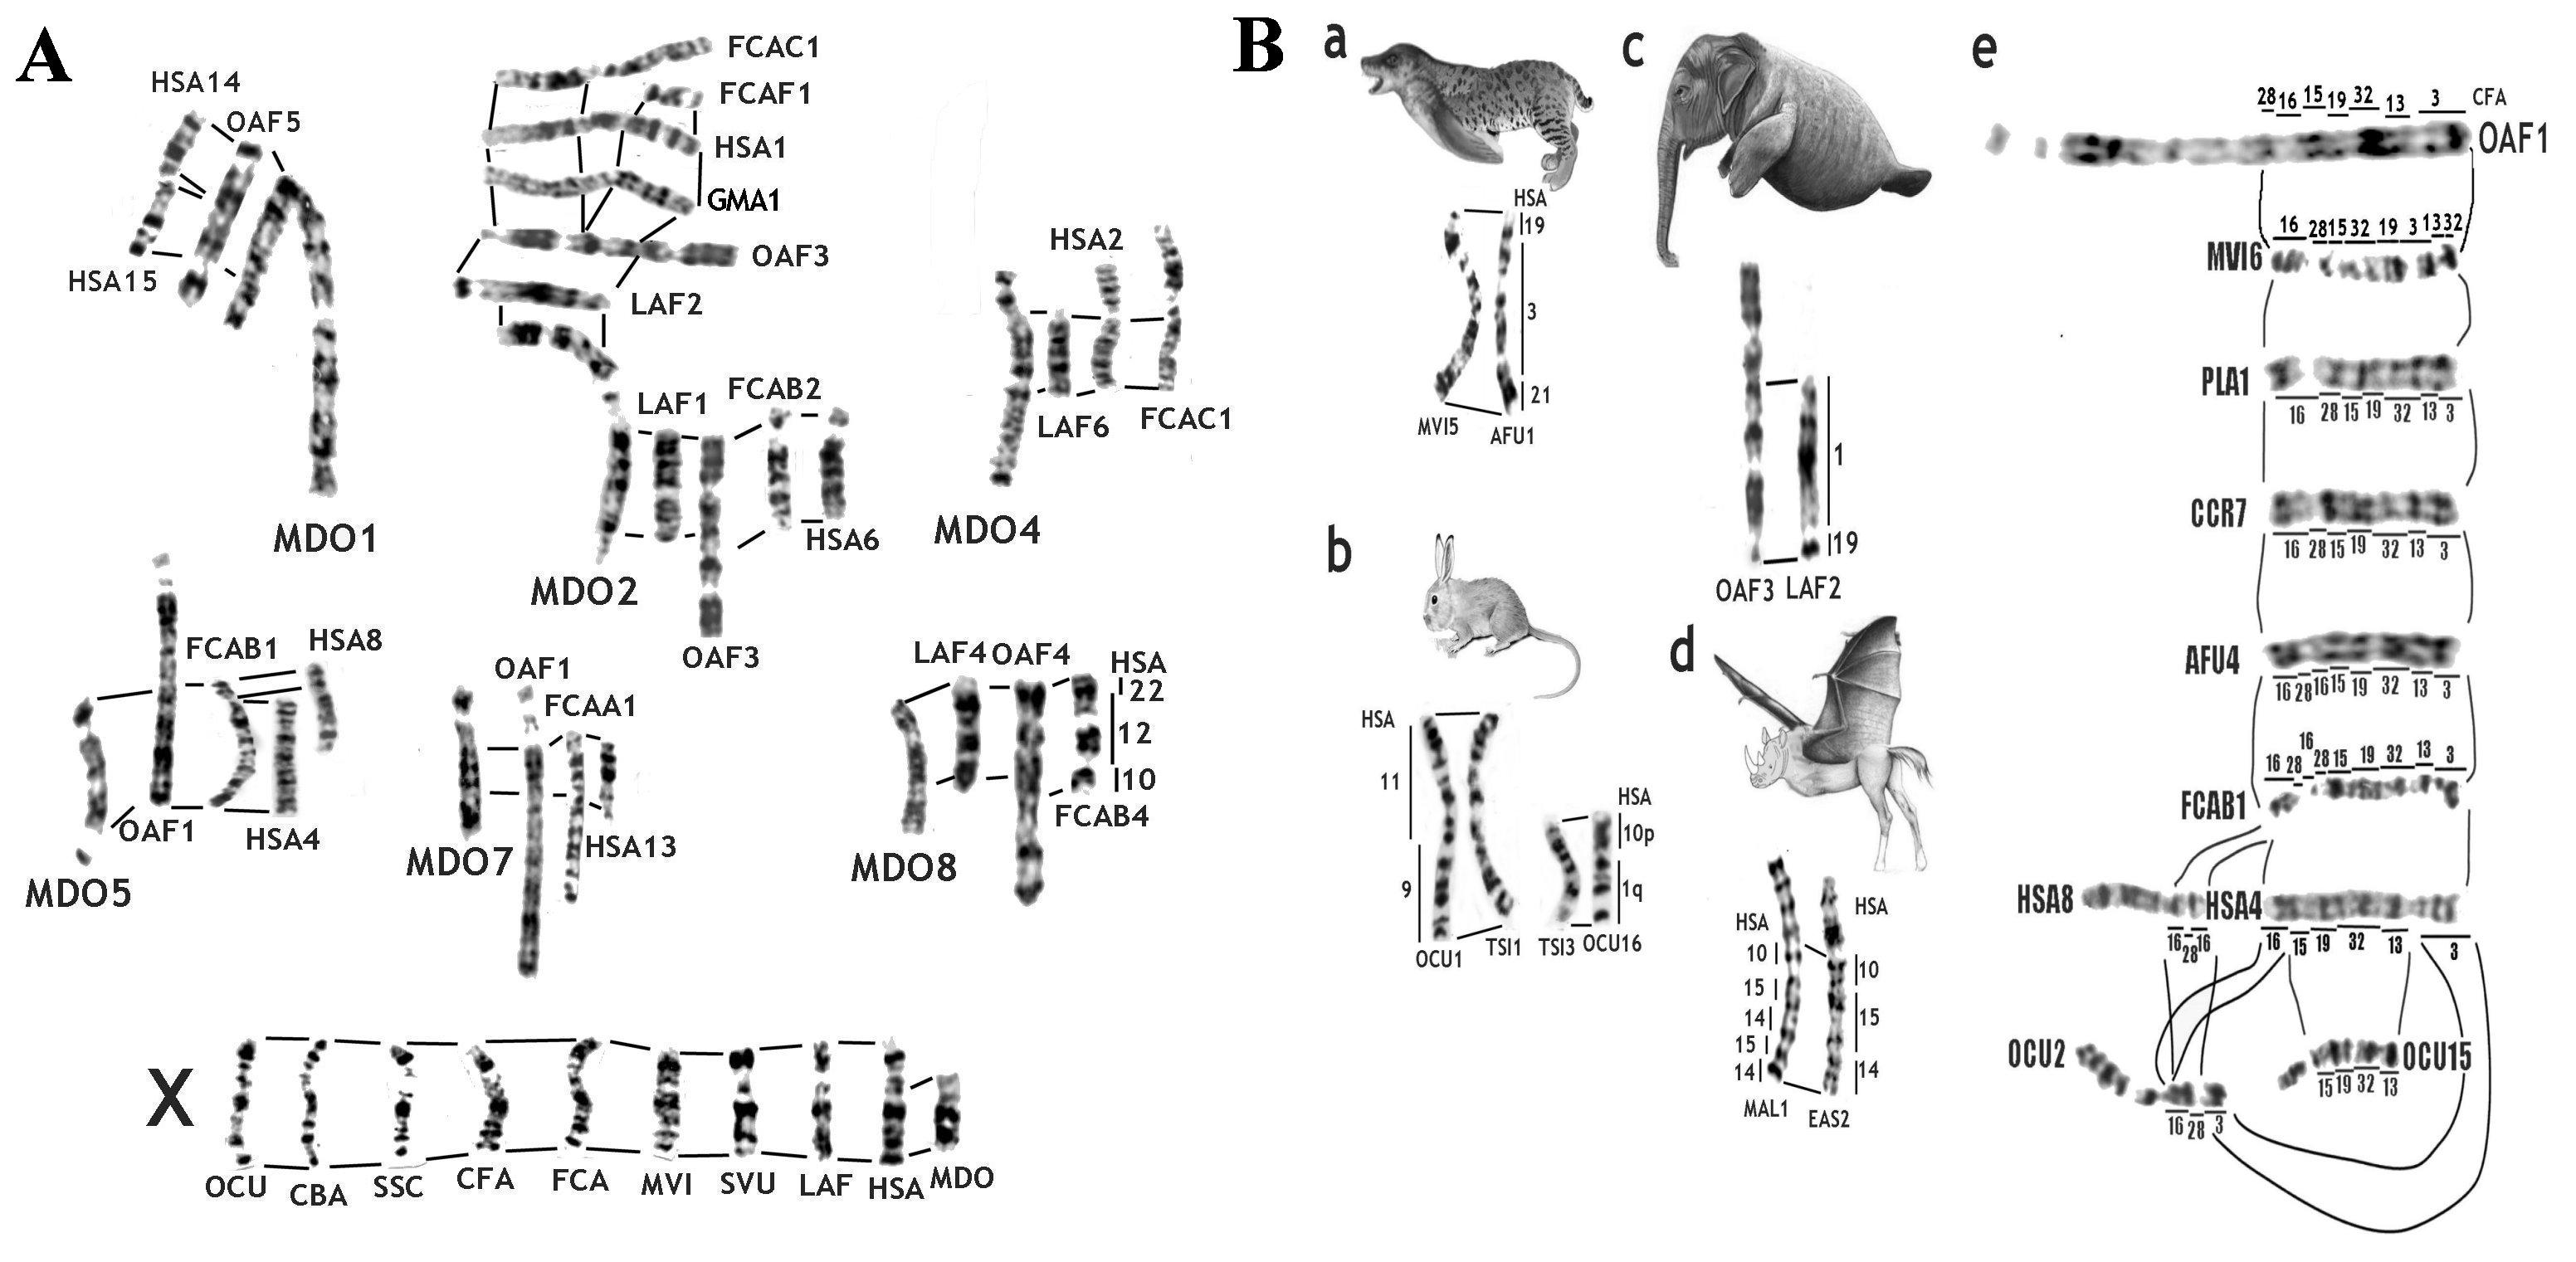 worksheet Karyotype Worksheet dog karyotype analysis worksheet the genome diversity and evolution of mammals